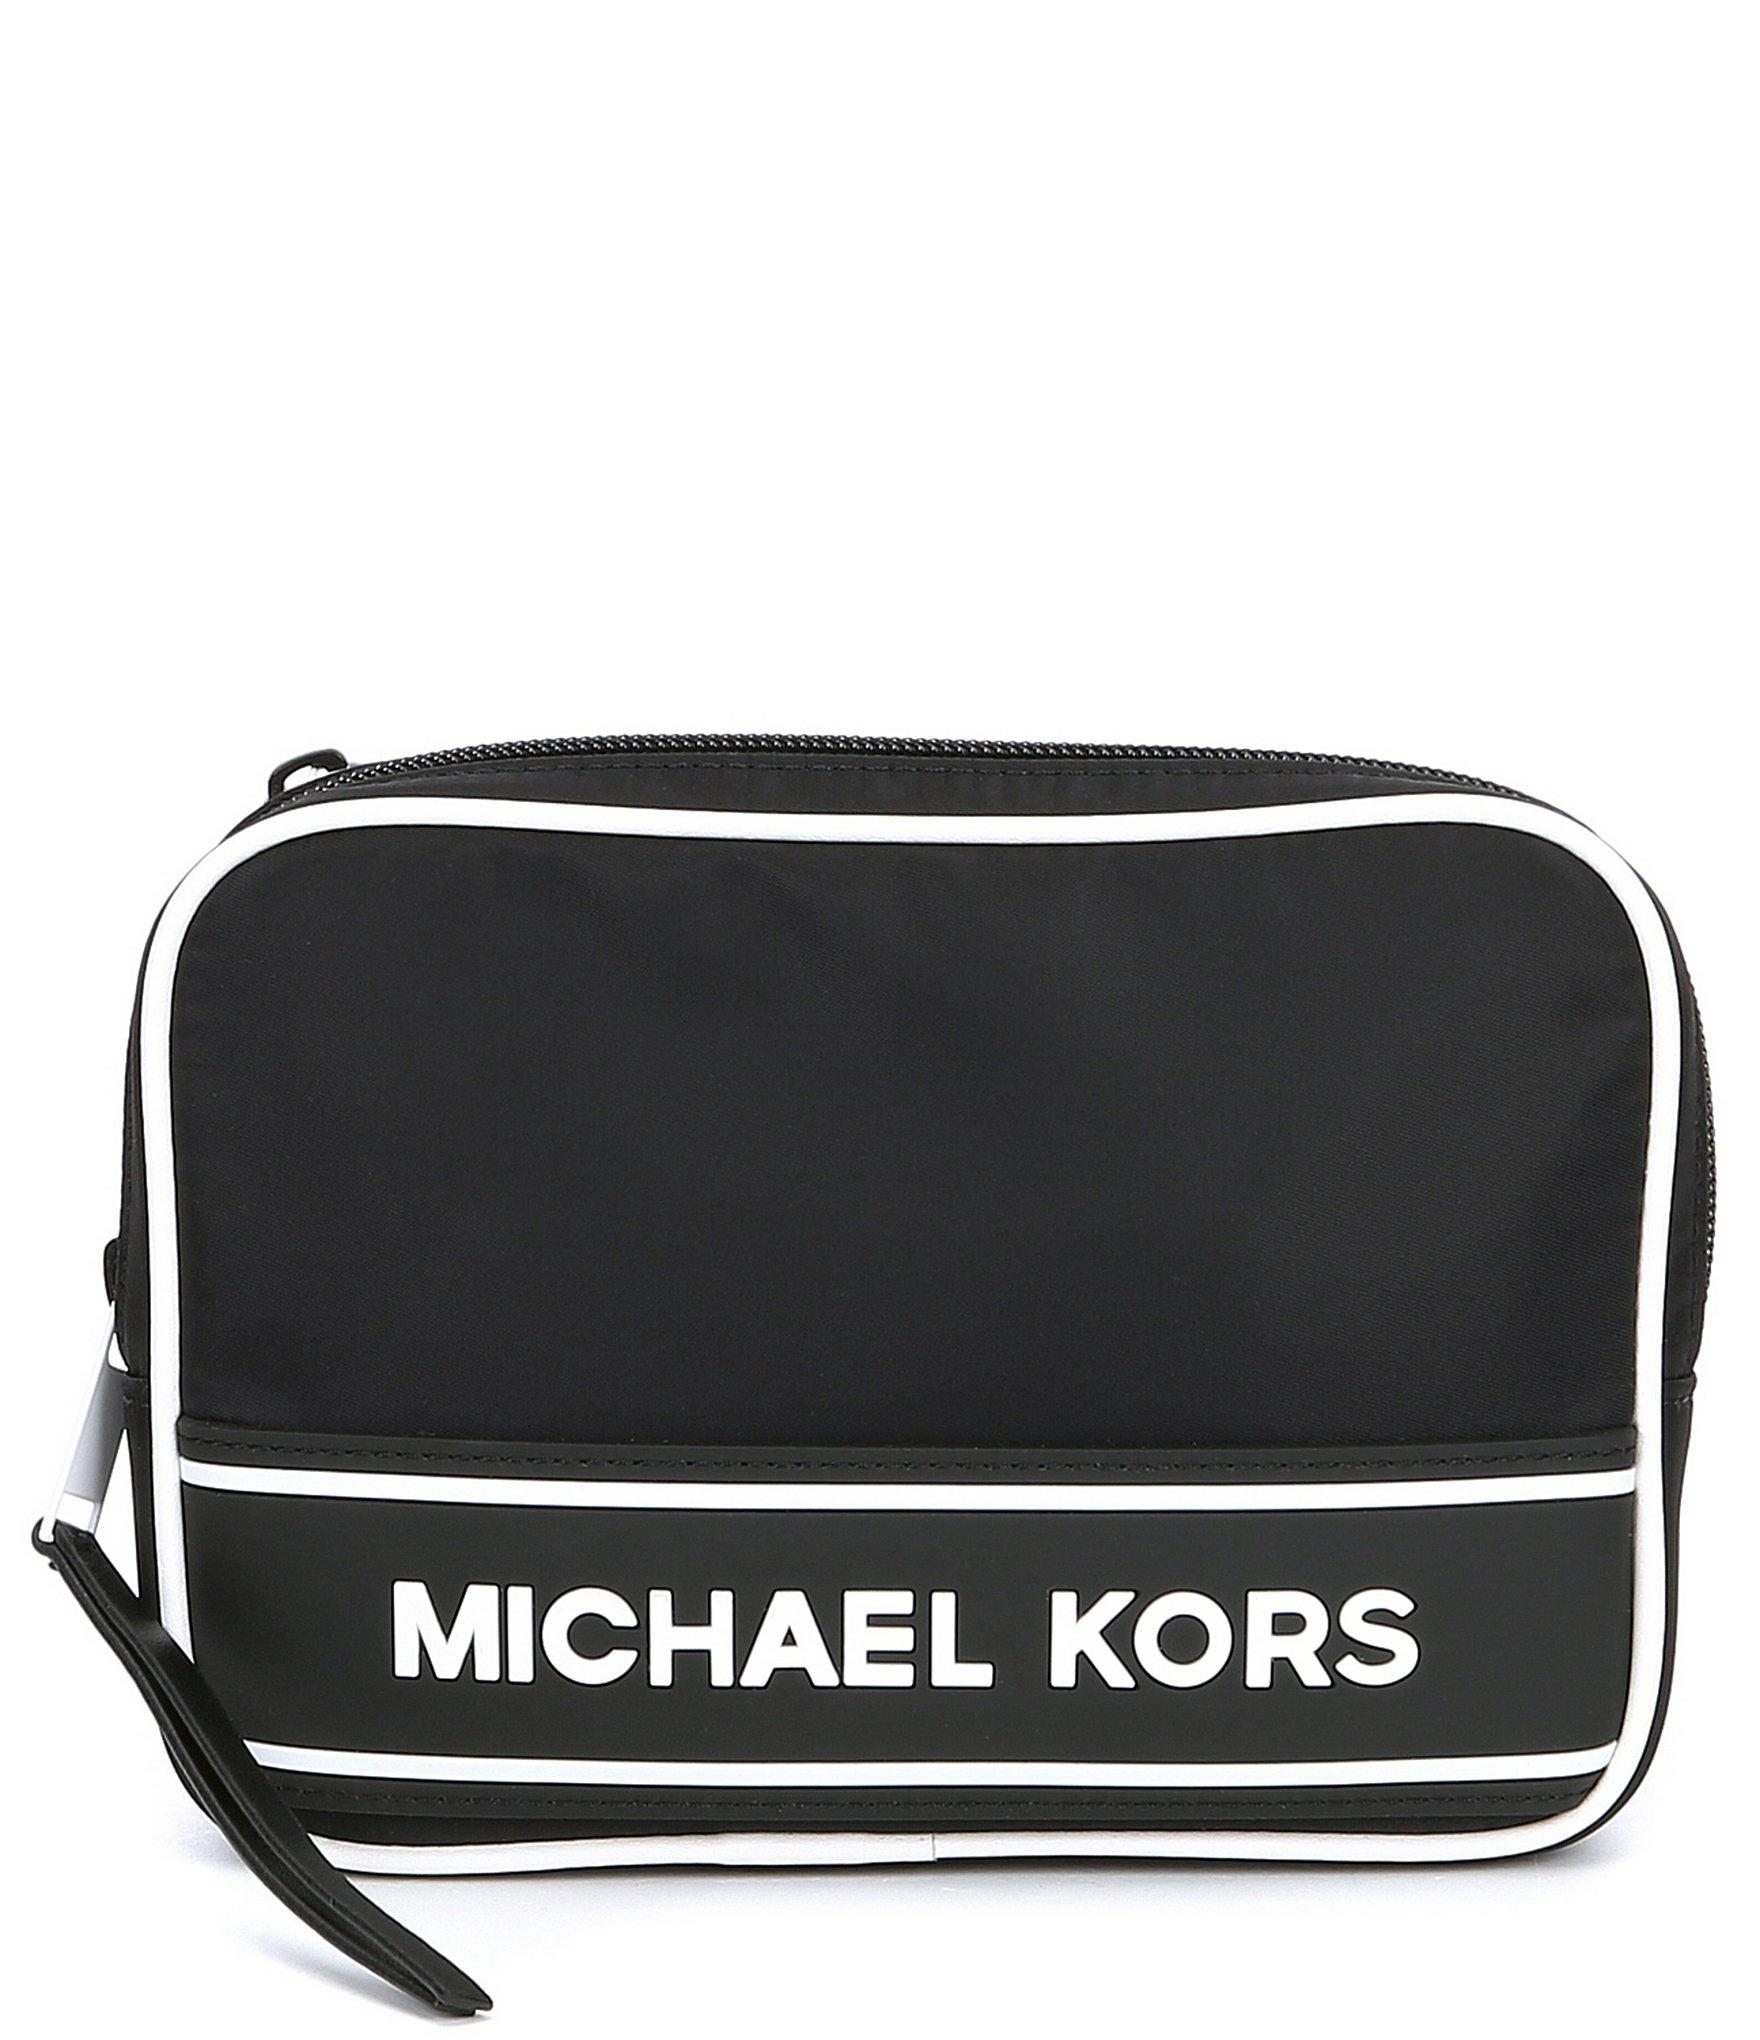 9310bc207daf66 Michael Kors - Black Boxy Nylon Belt Bag - Lyst. View fullscreen